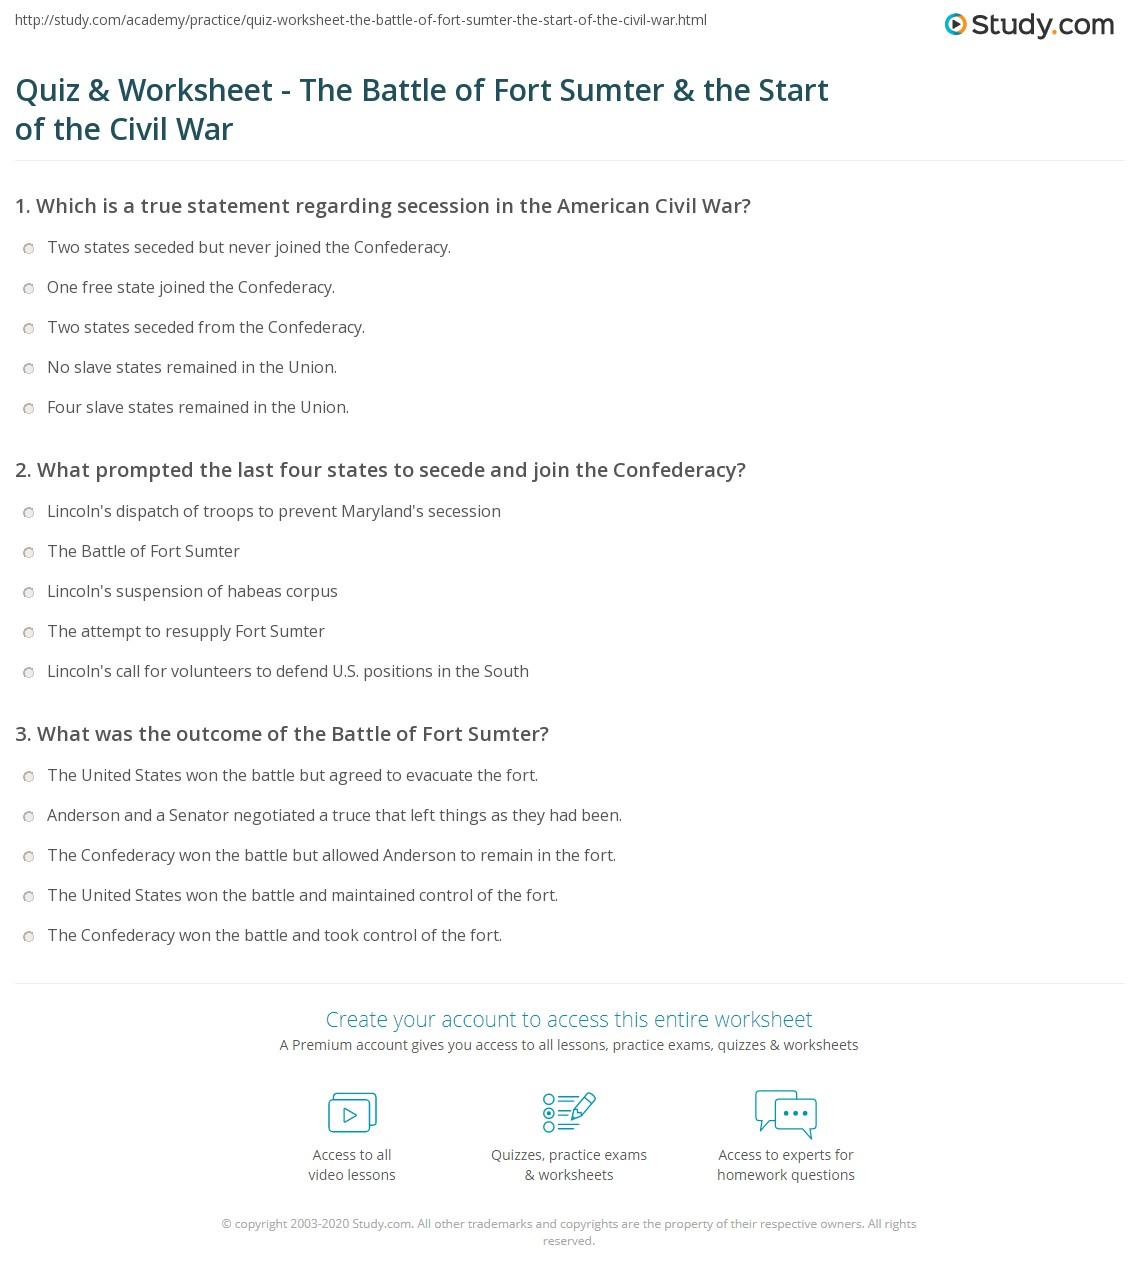 hight resolution of Quiz \u0026 Worksheet - The Battle of Fort Sumter \u0026 the Start of the Civil War    Study.com